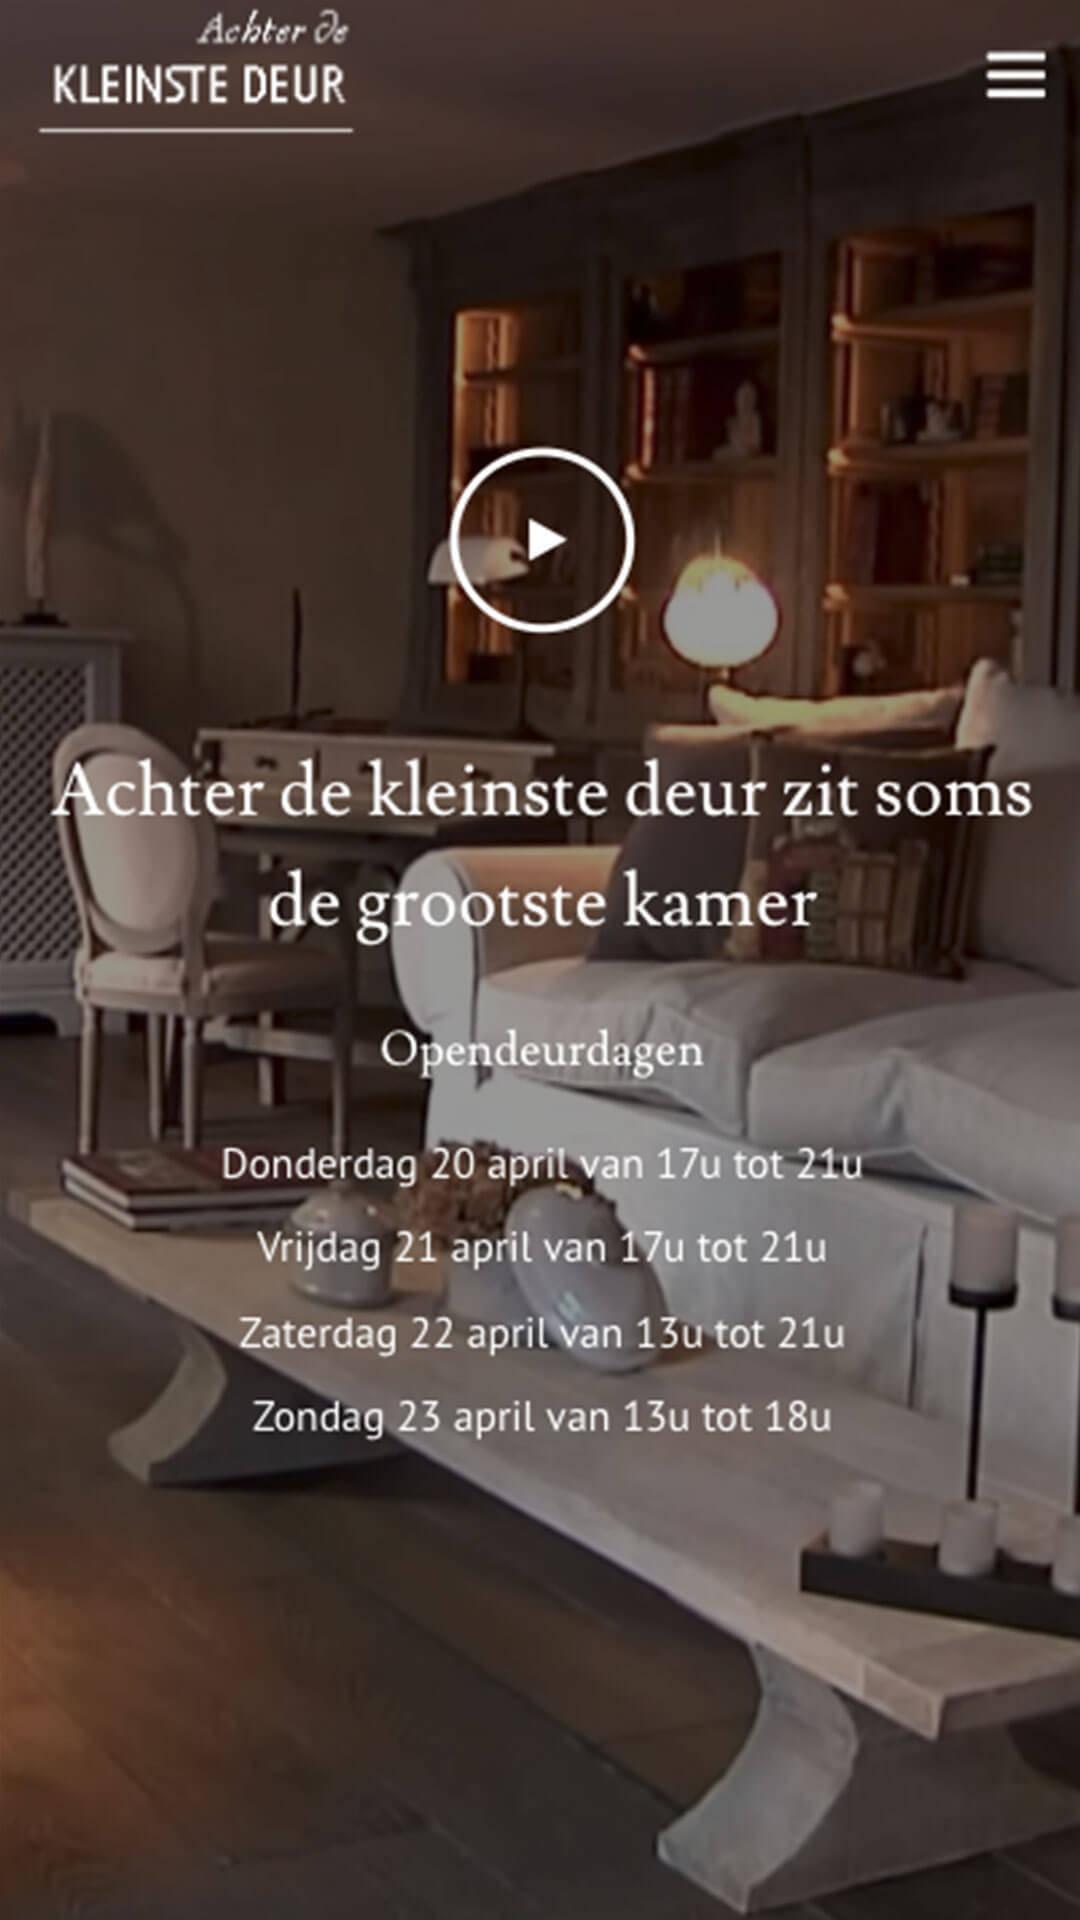 achterdekleinstedeur.be mobile preview